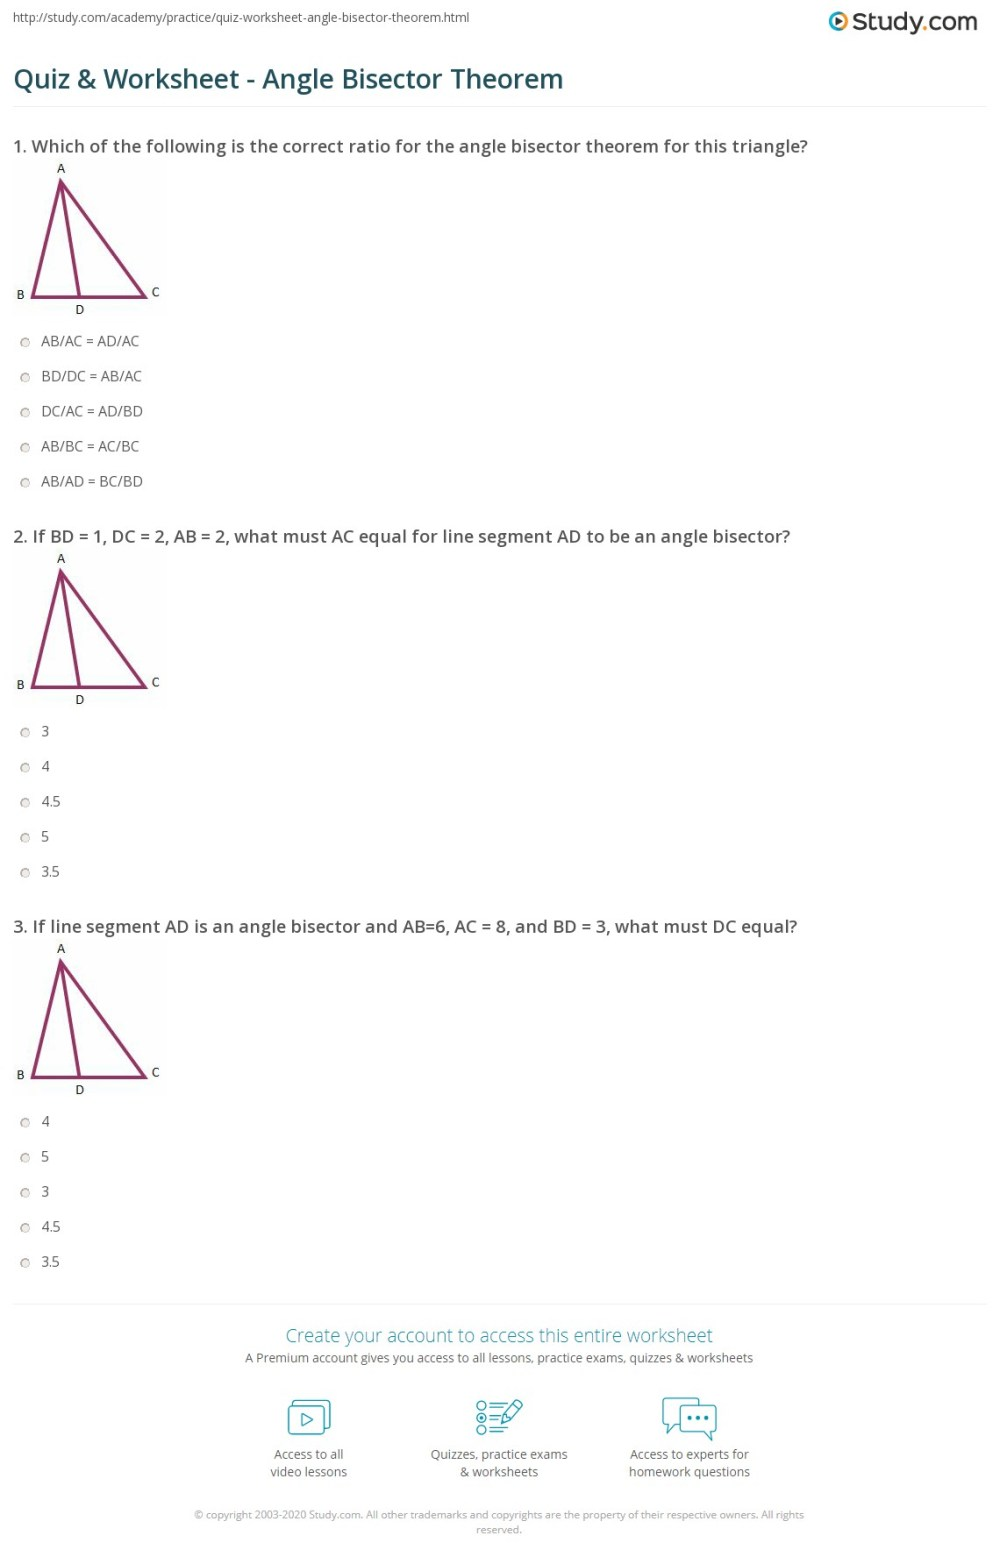 medium resolution of Quiz \u0026 Worksheet - Angle Bisector Theorem   Study.com